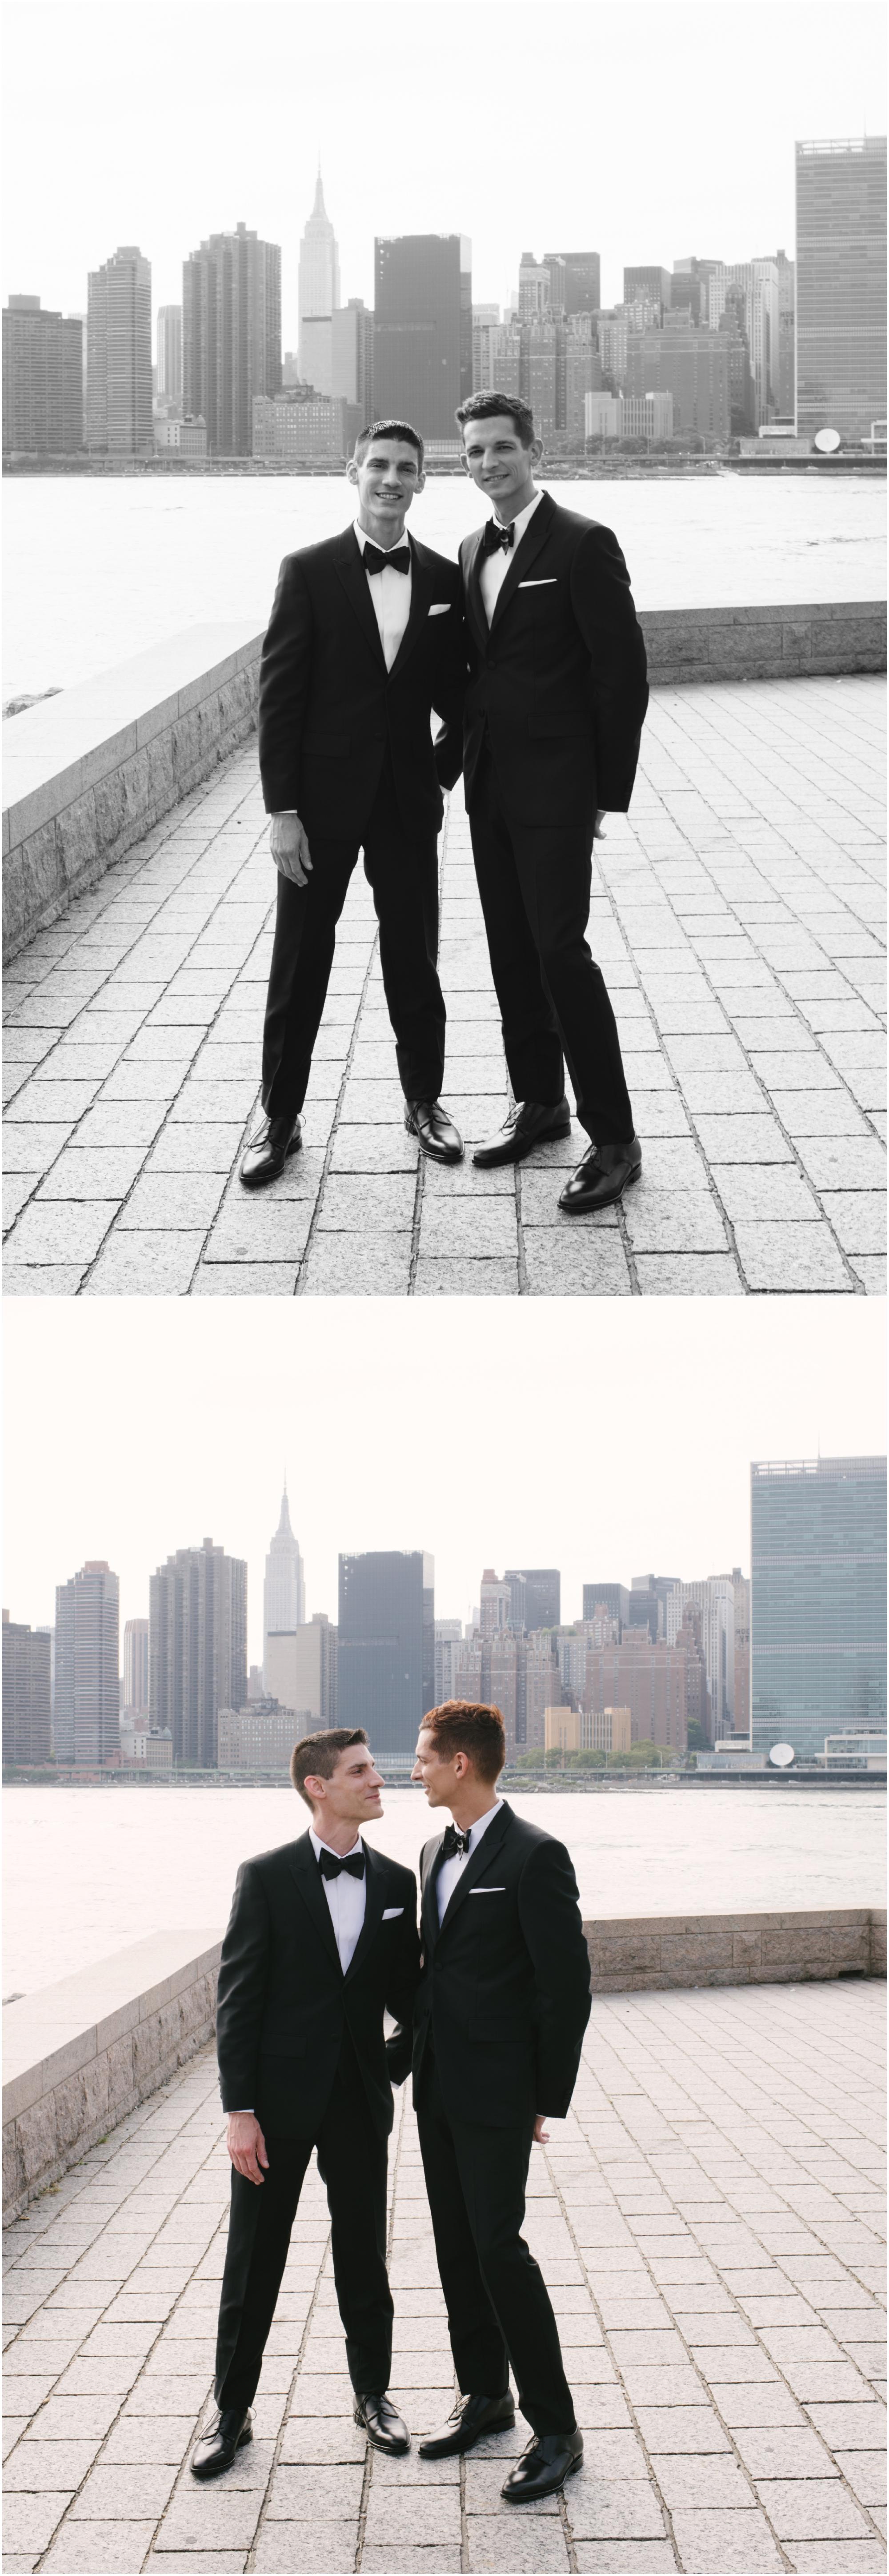 gay-wedding-photographer-williamsburgphotostudios-thefoundry-wedding-photographer_0016.jpg